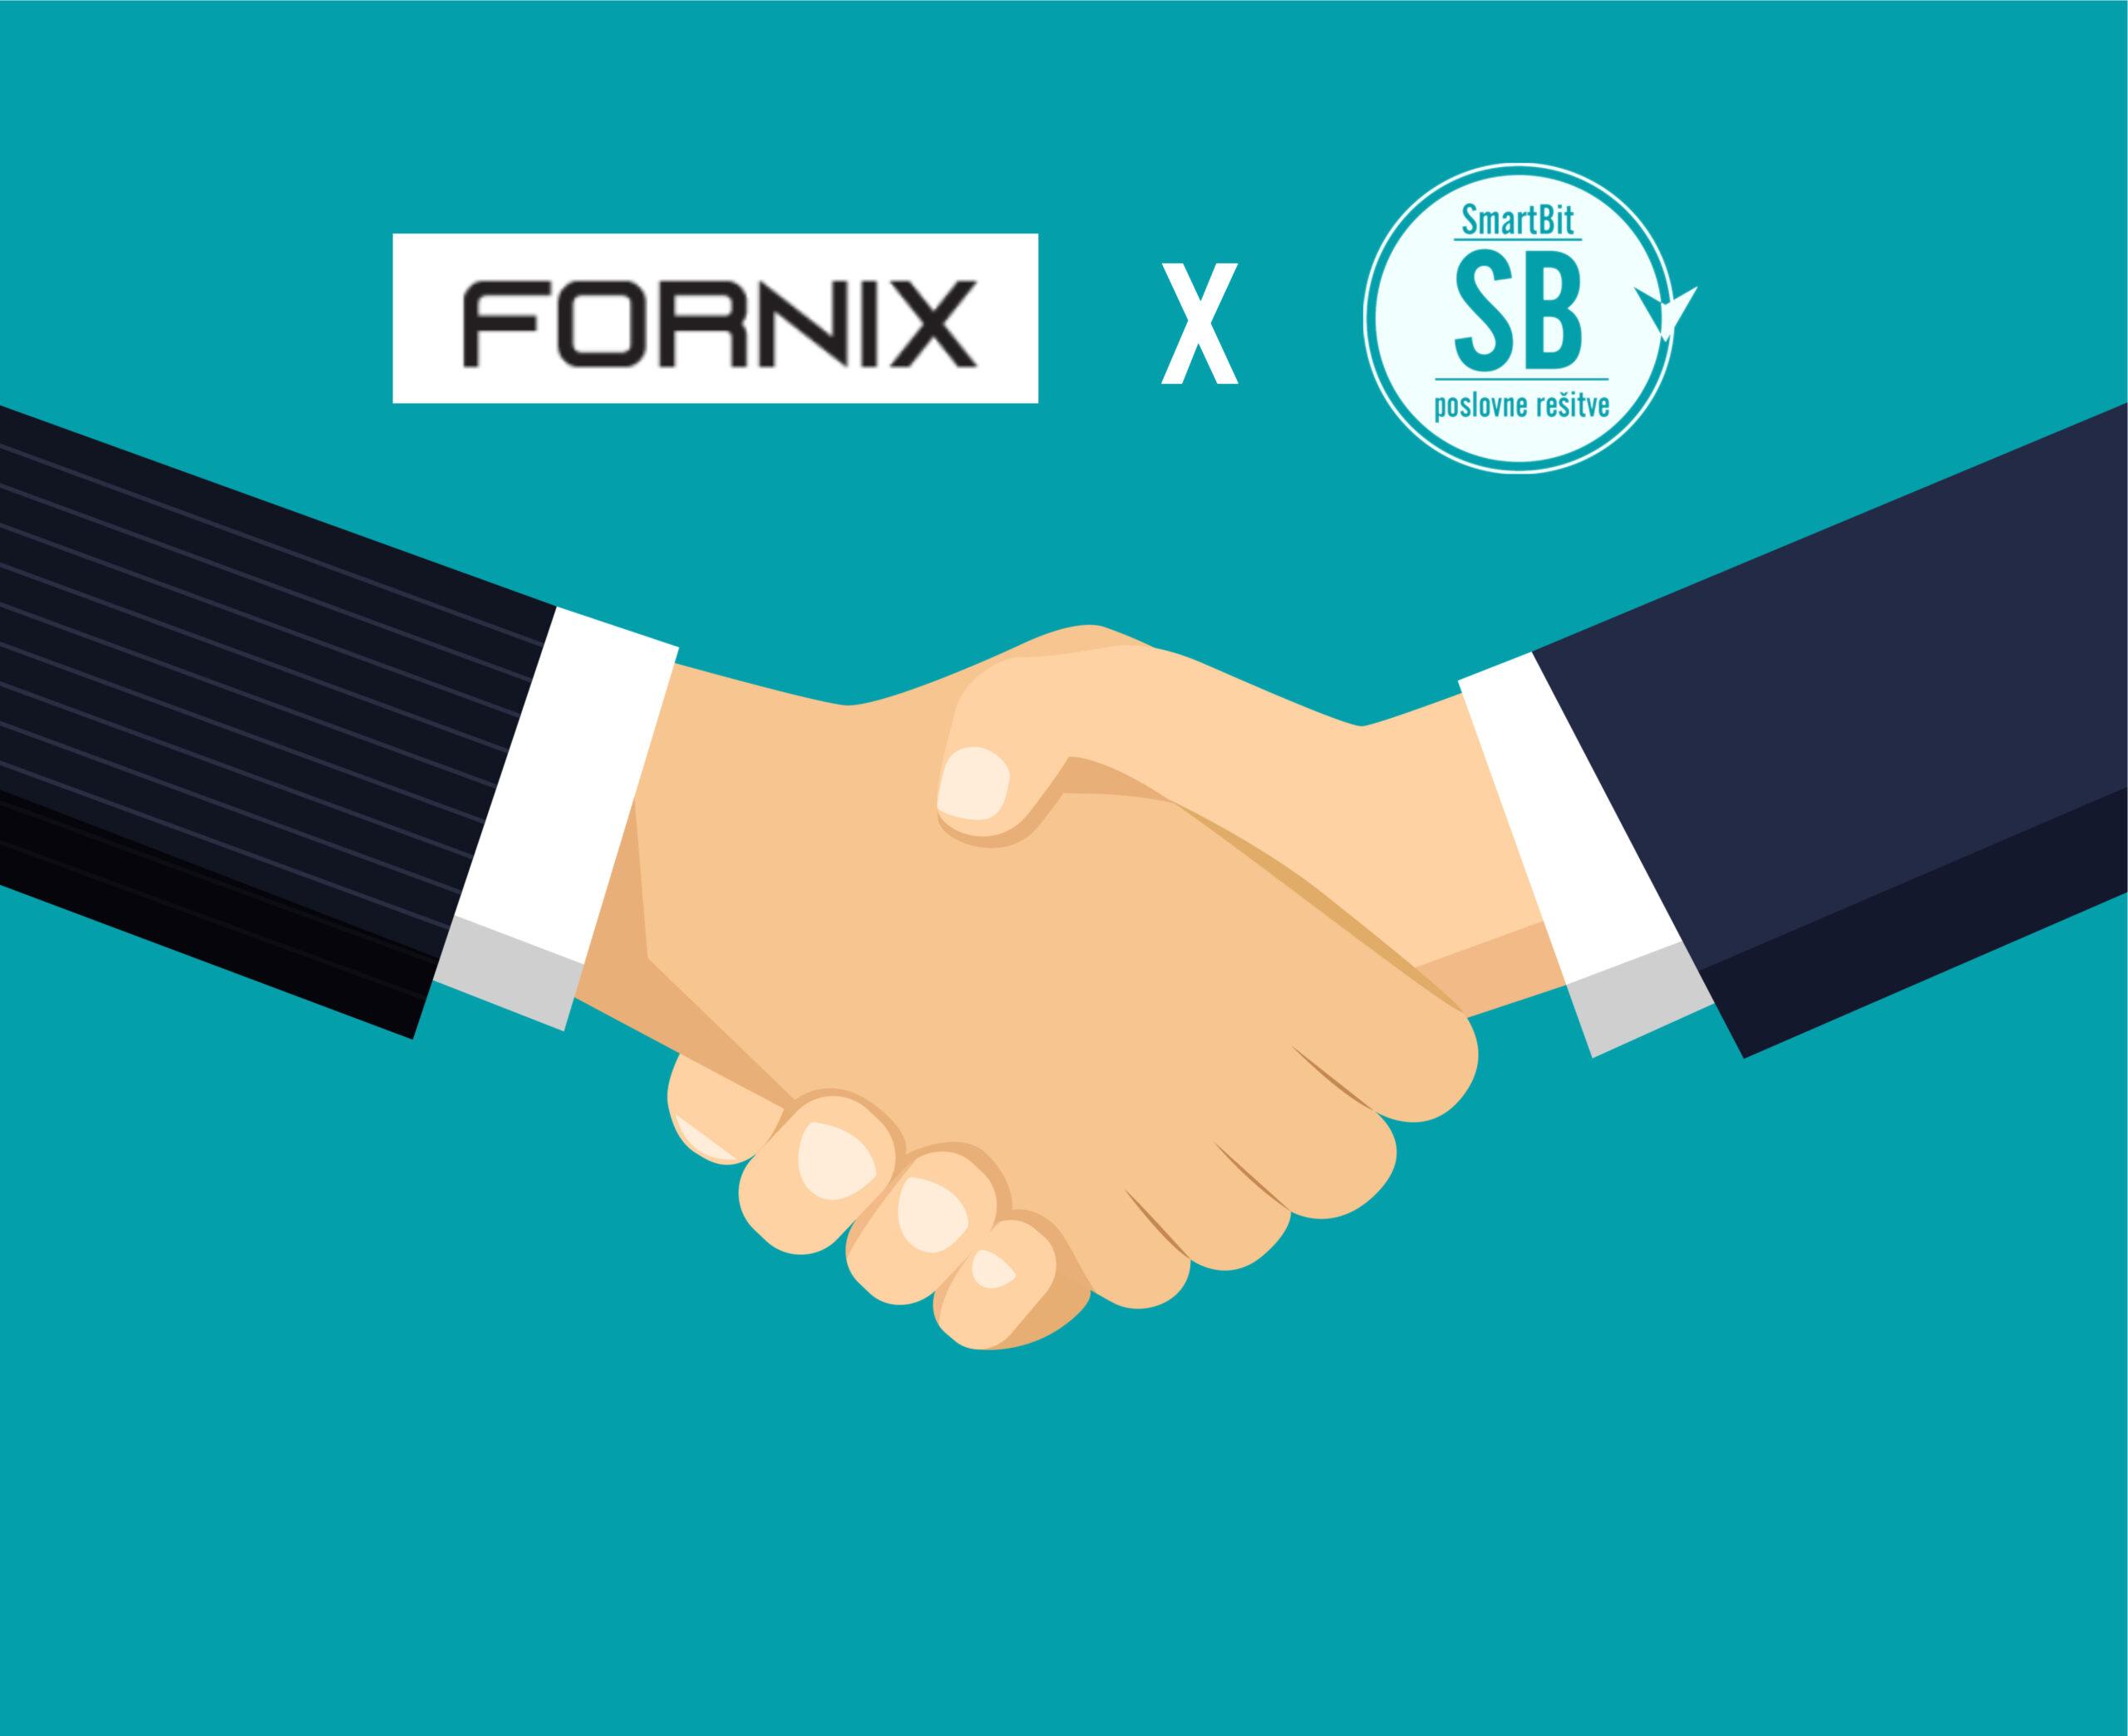 SmartBit x FORNIX – vpeljava @SmartBit rešitev